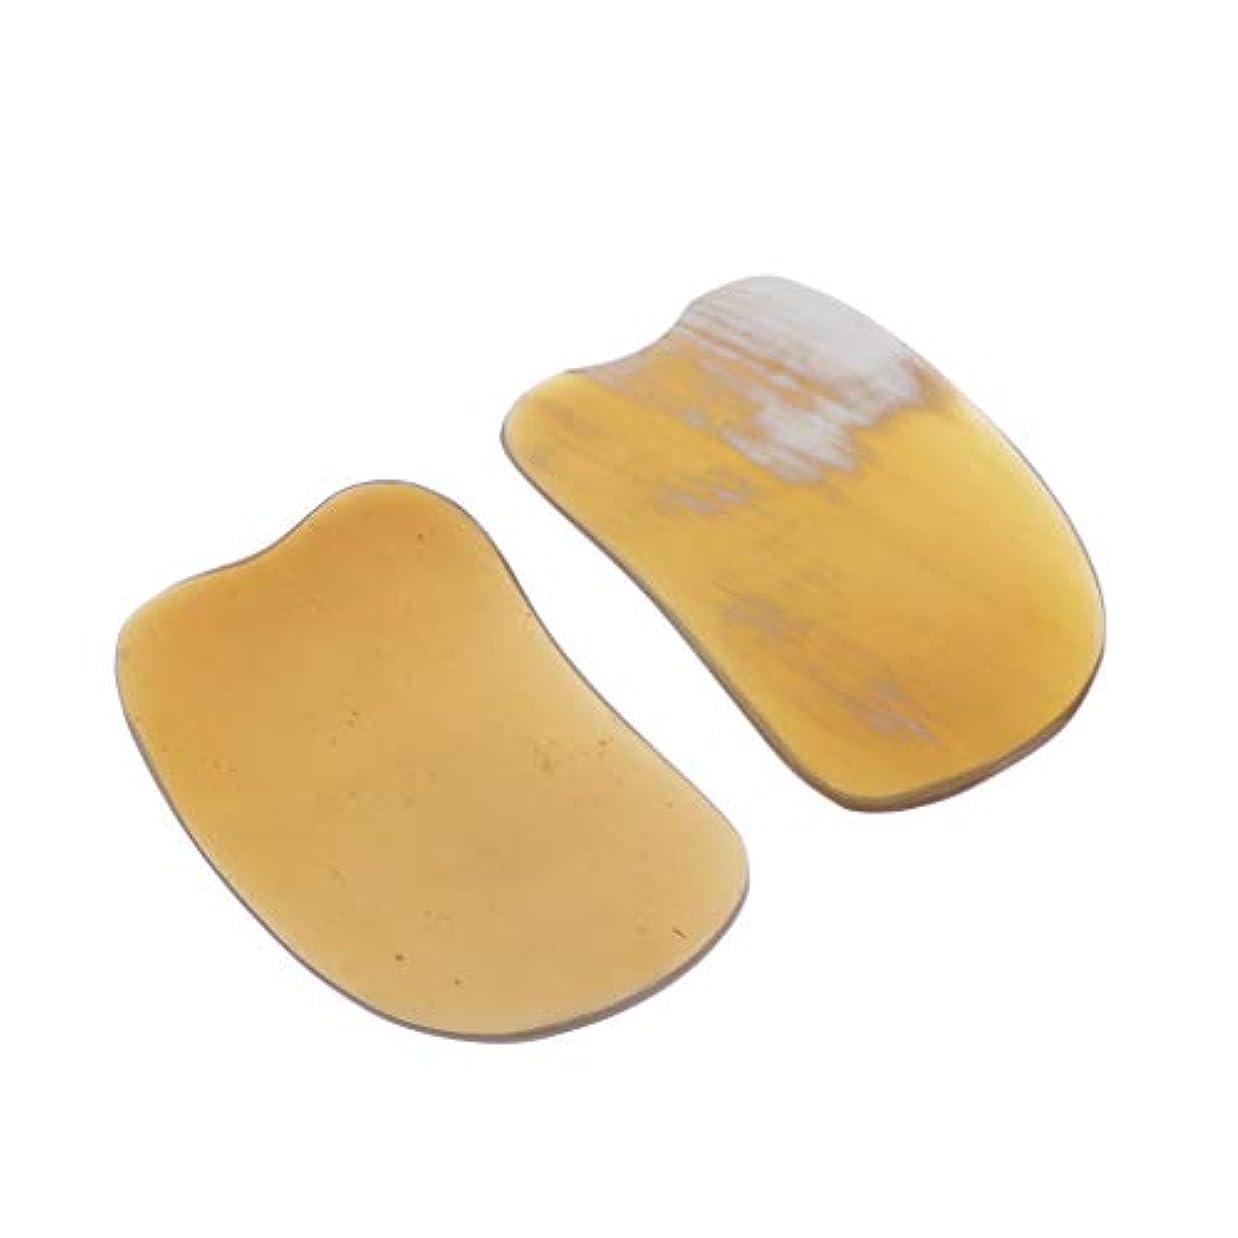 P Prettyia ナチュラル ボディフェイシャルグアシャ 削り盤ハンドヘルドスパ マッサージツール 全4サイズ - 02